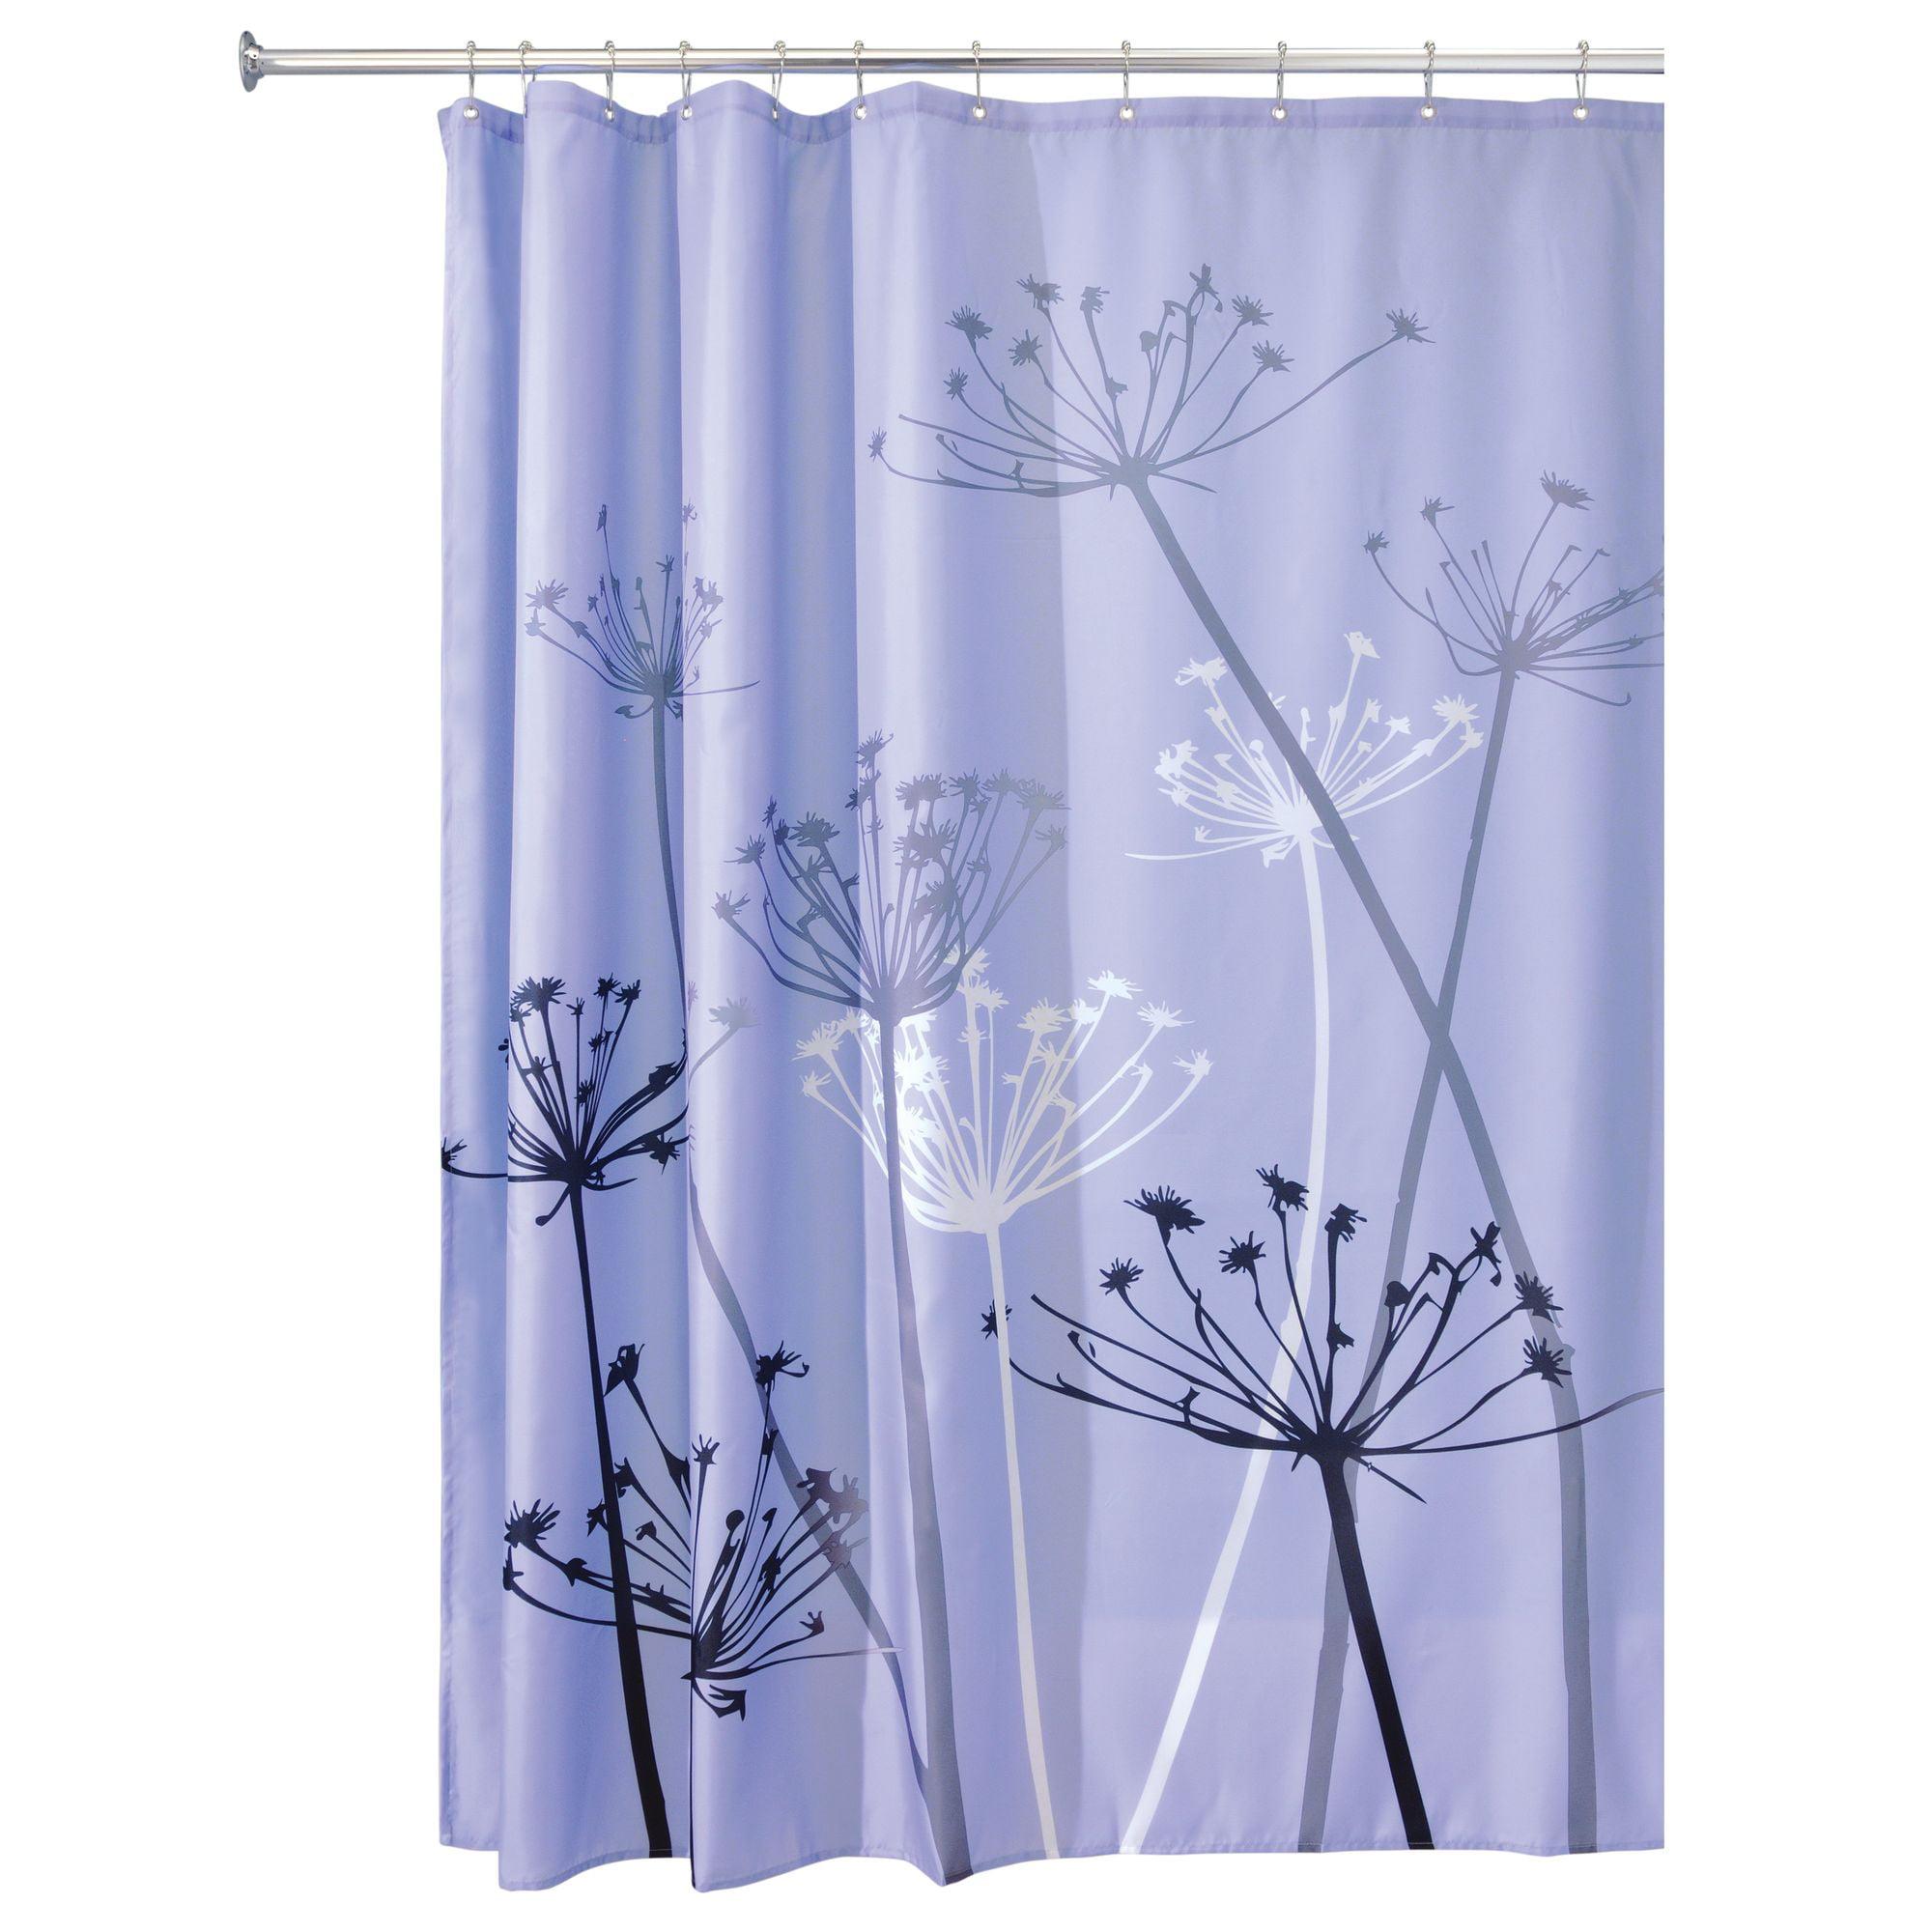 Interdesign Thistle Fabric Shower Curtain Standard 72 X 72